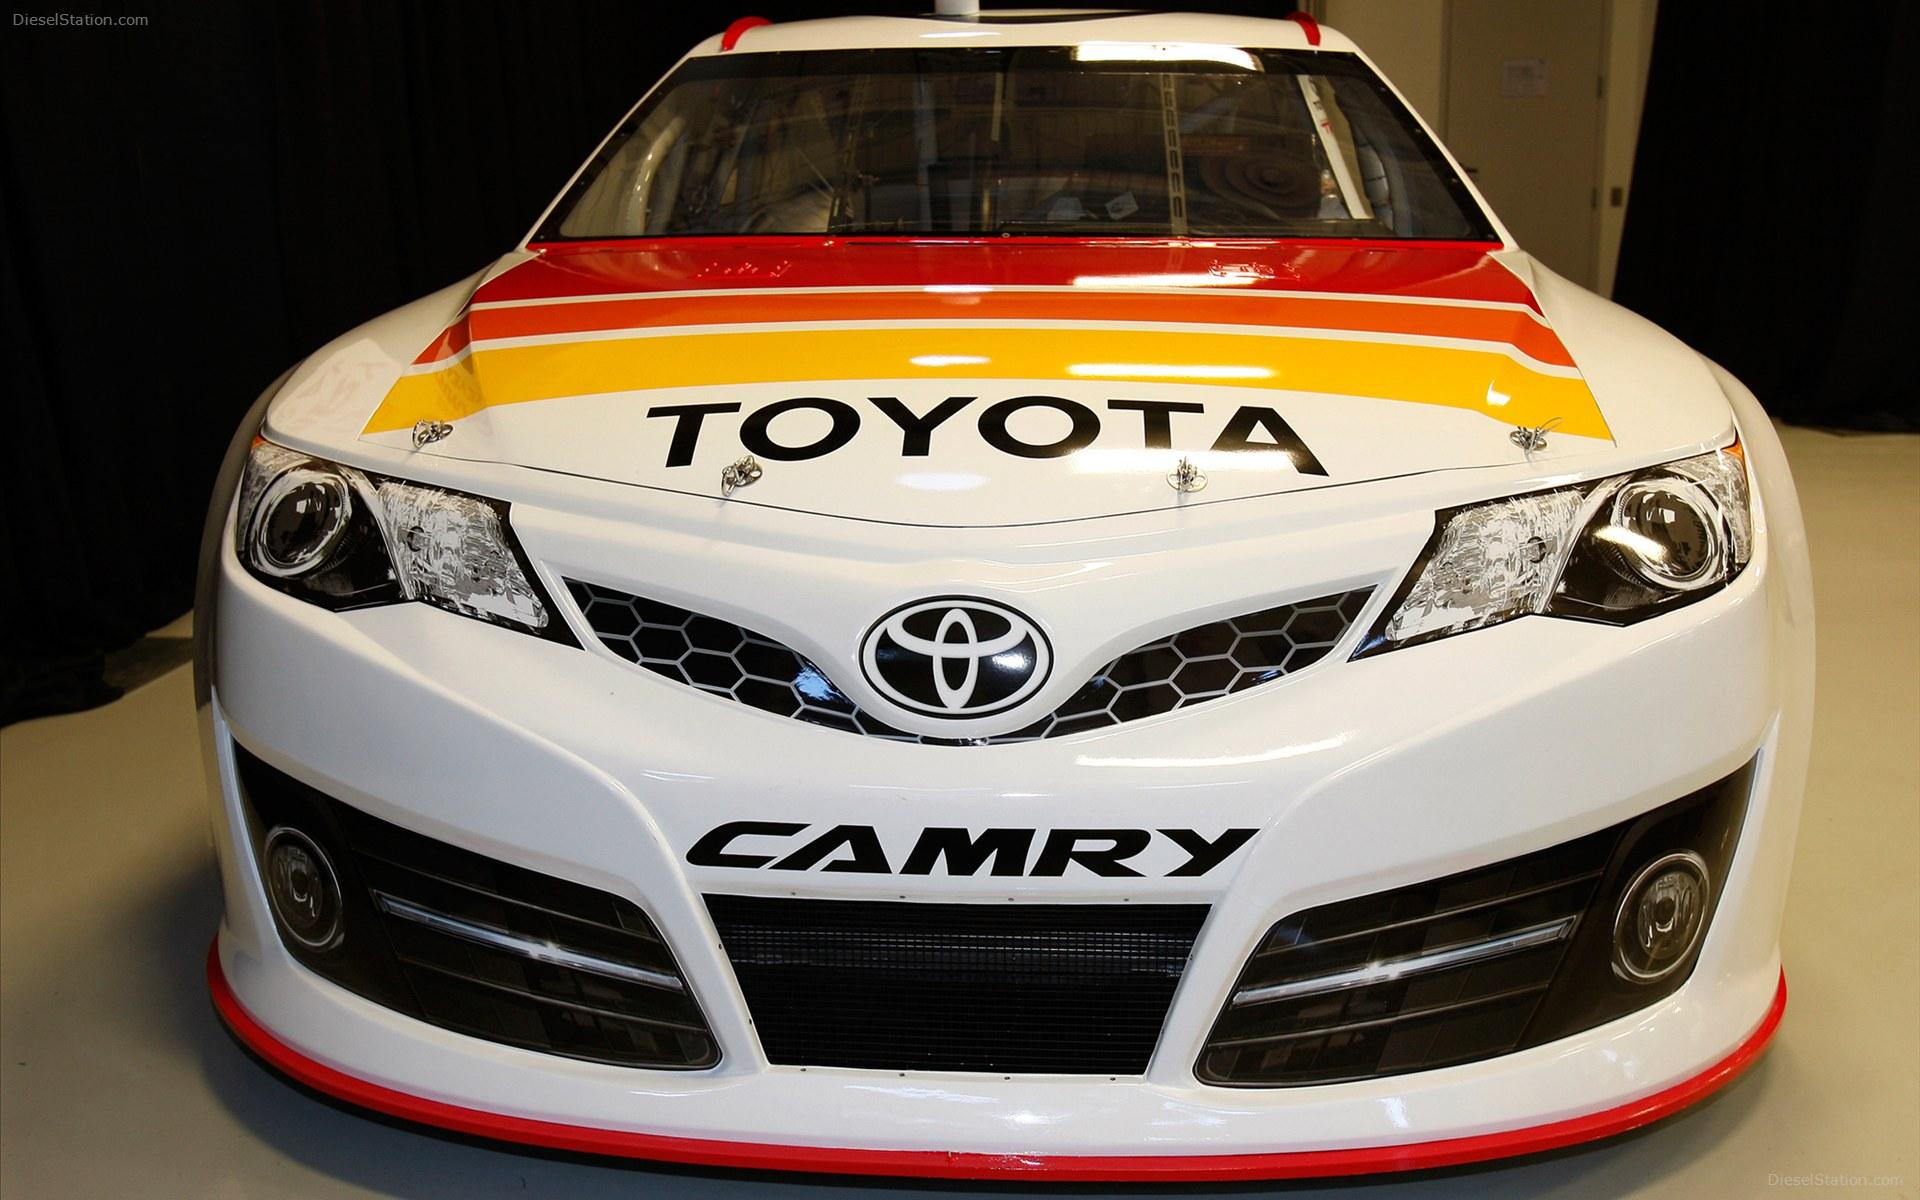 Toyota Nascar 2013 Camry Wallpaper 1080p | Car Wallpapers